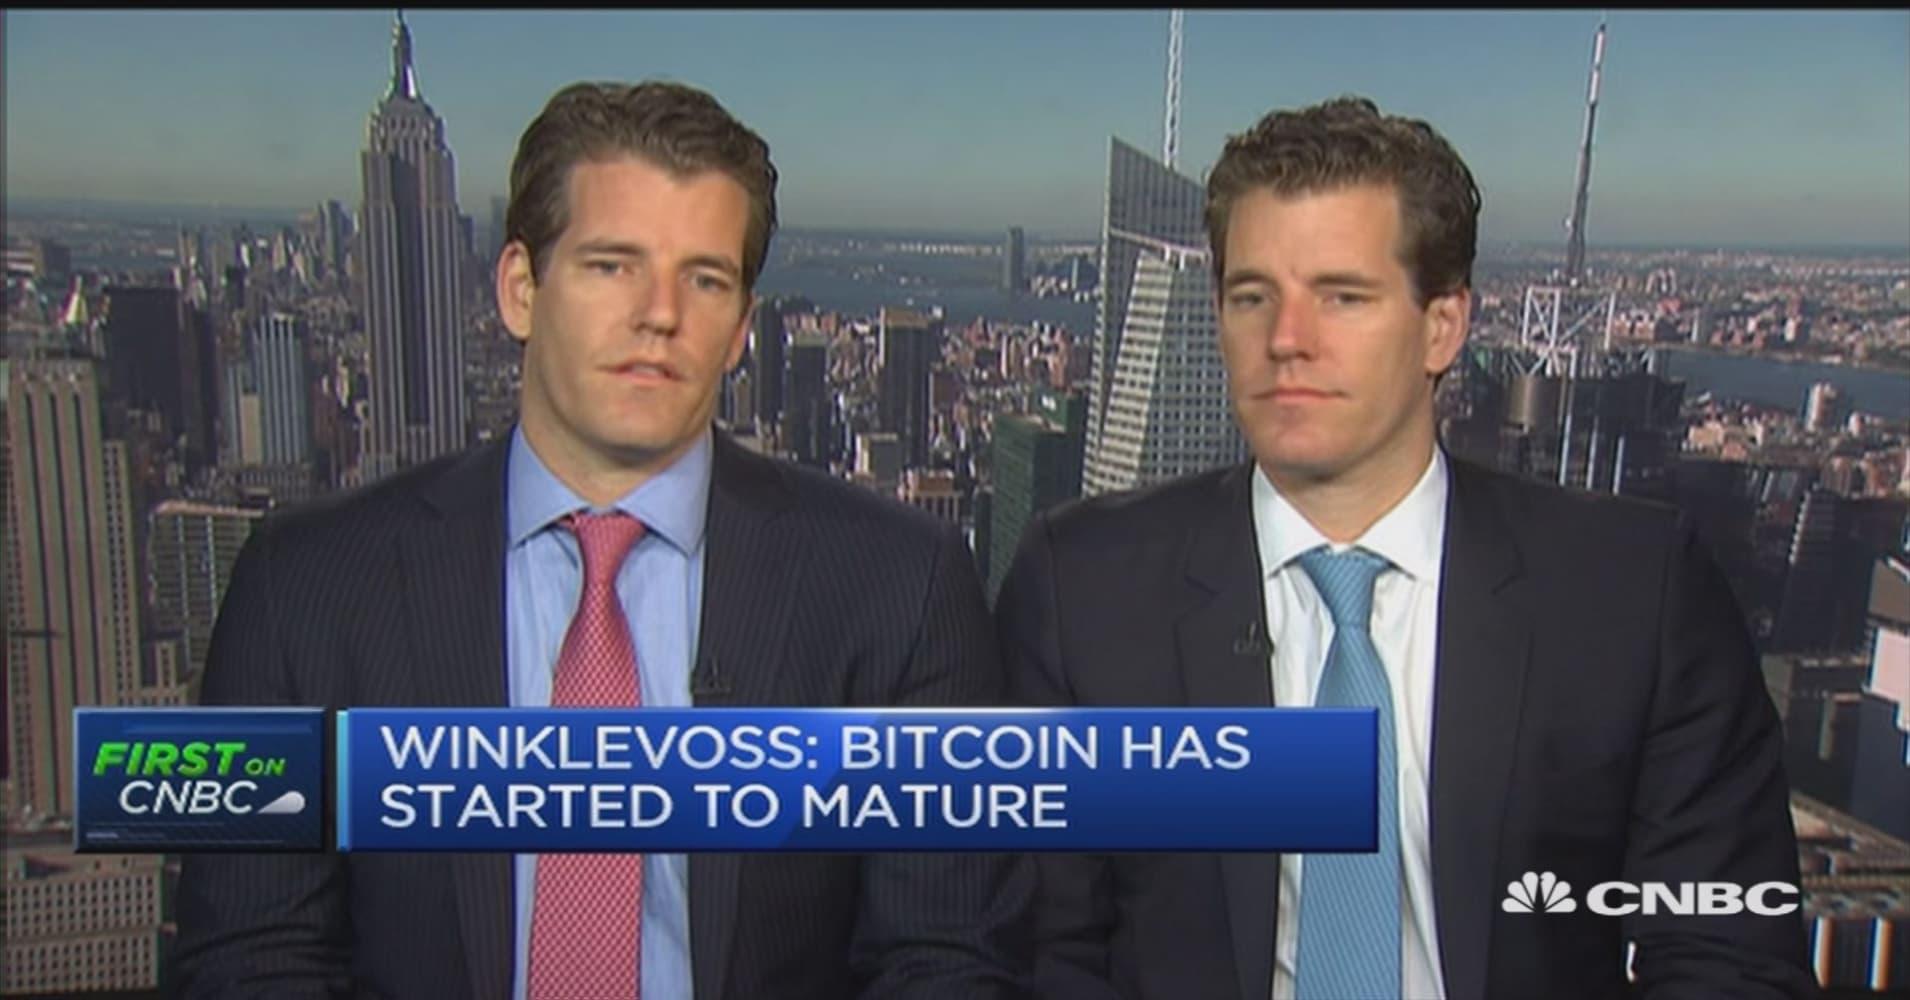 Winklevoss Cryptocurrency